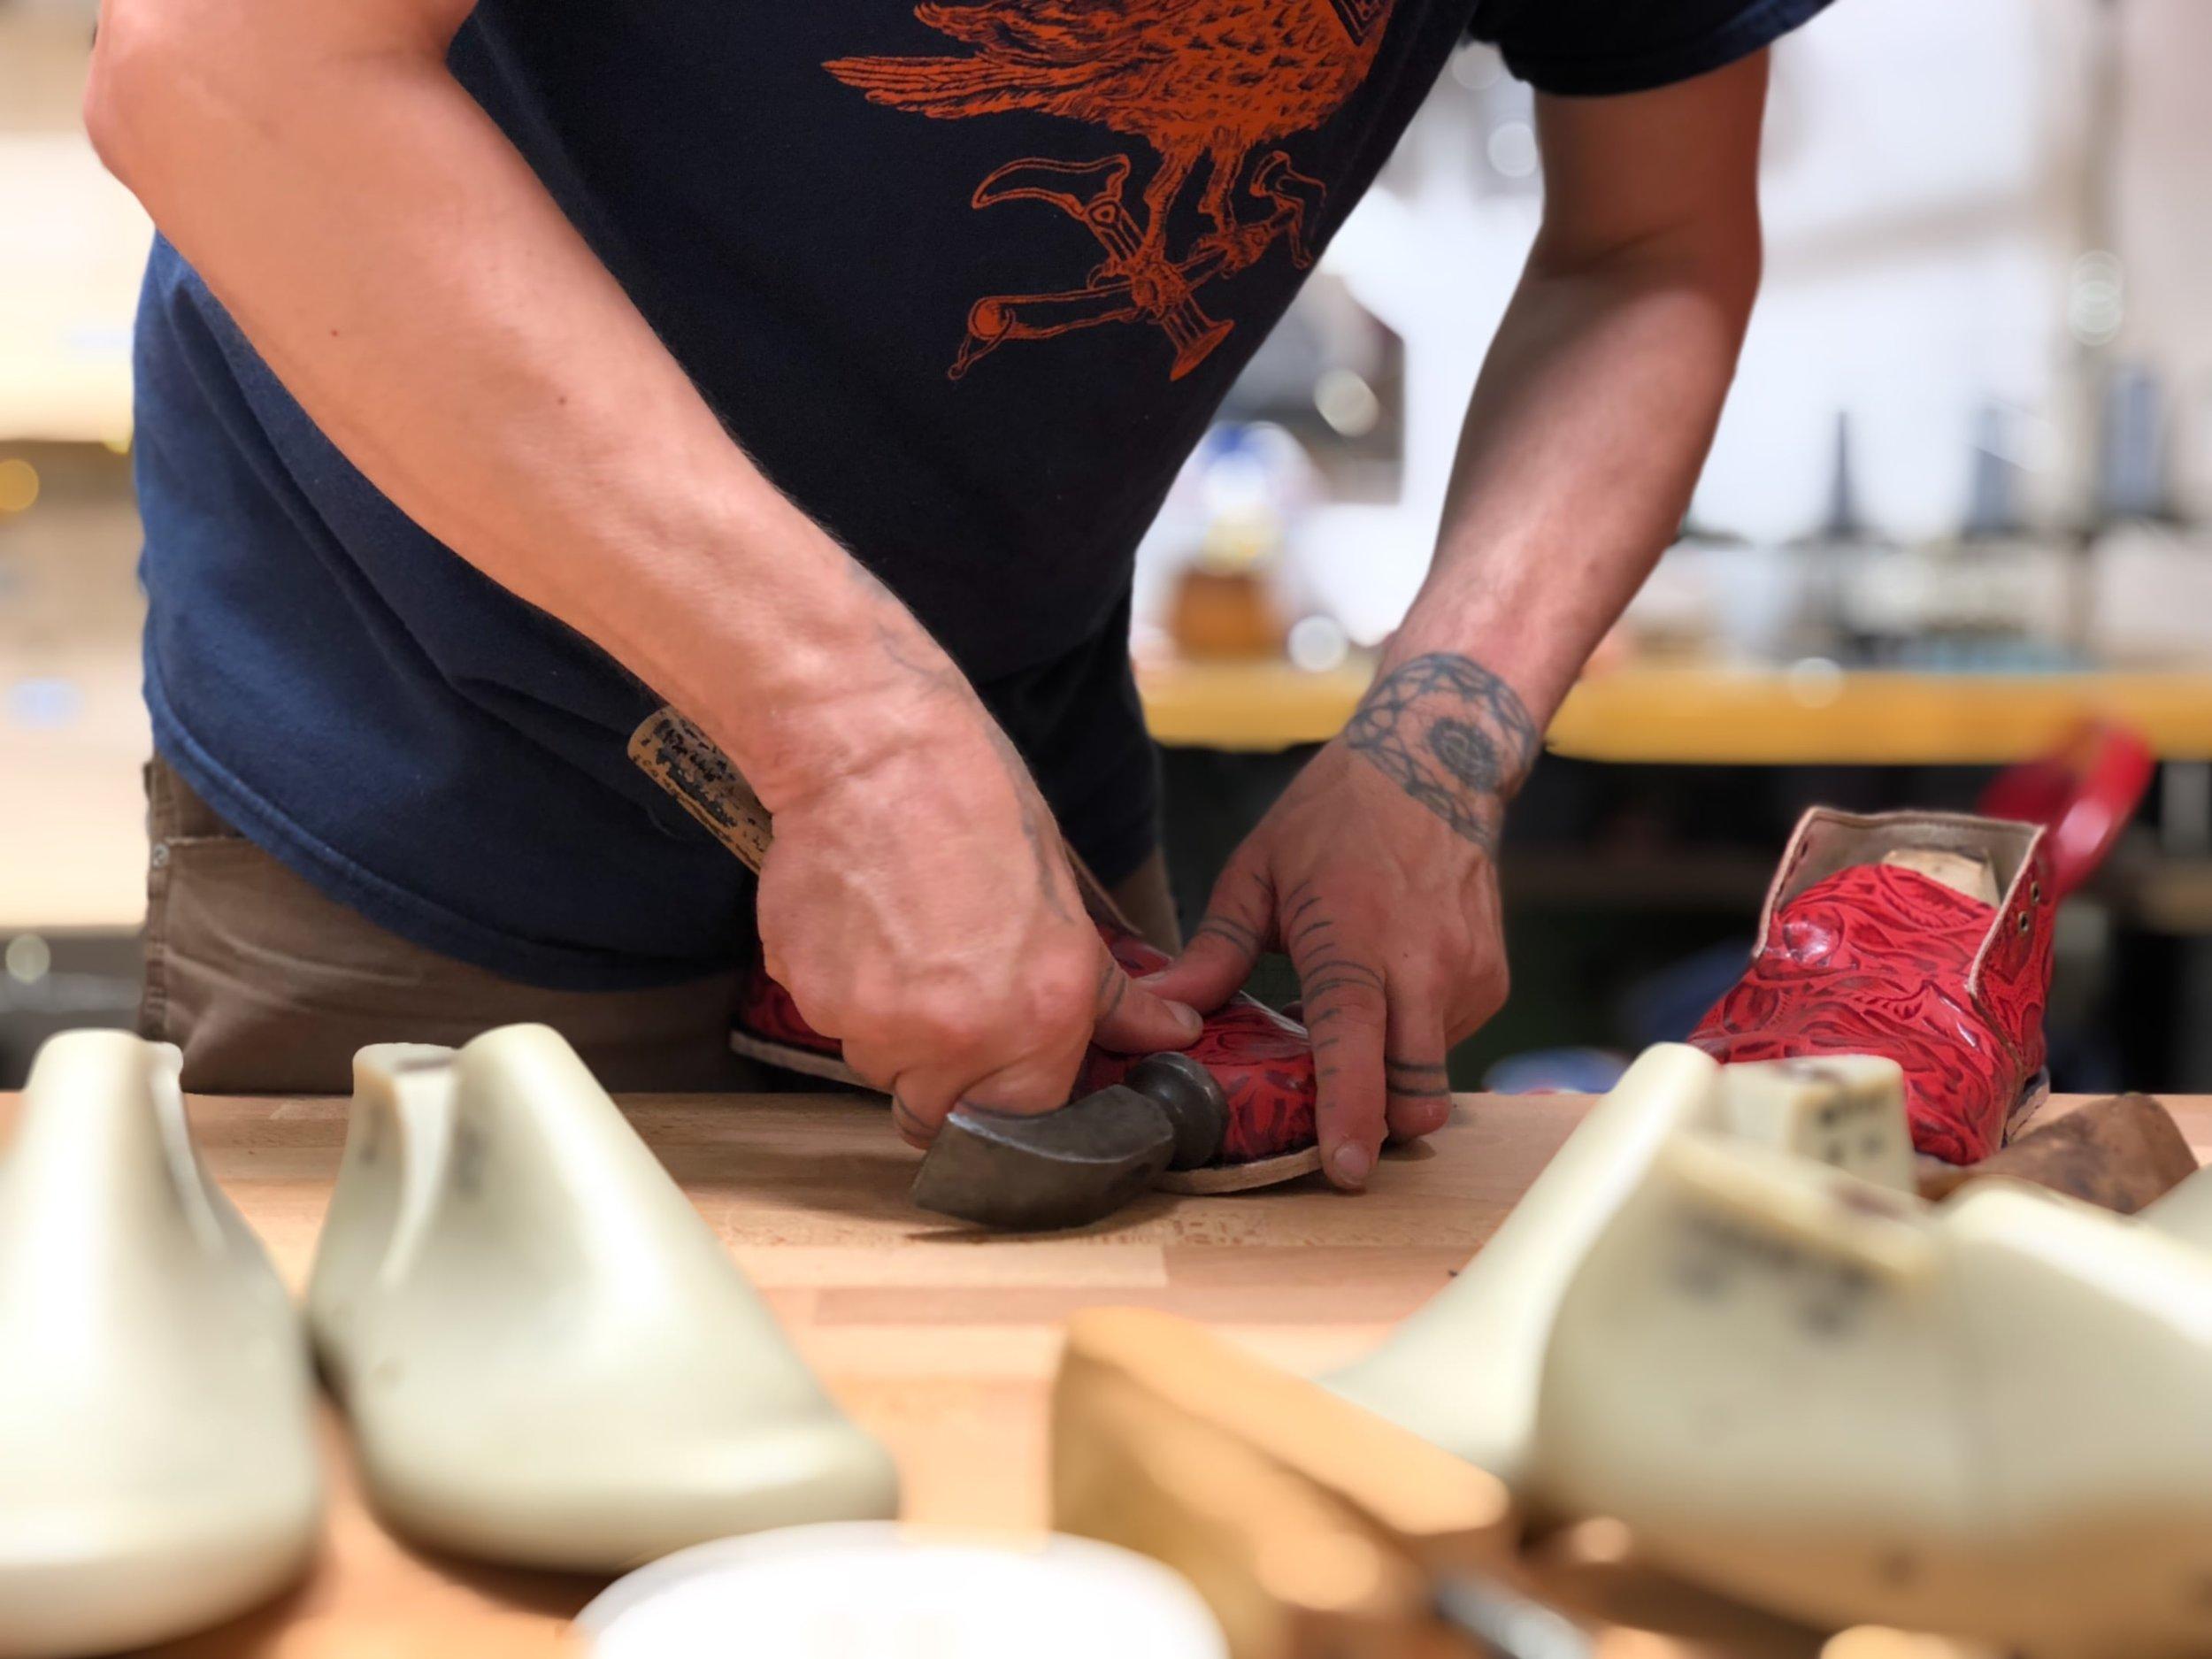 shoemaking-8-min.JPG